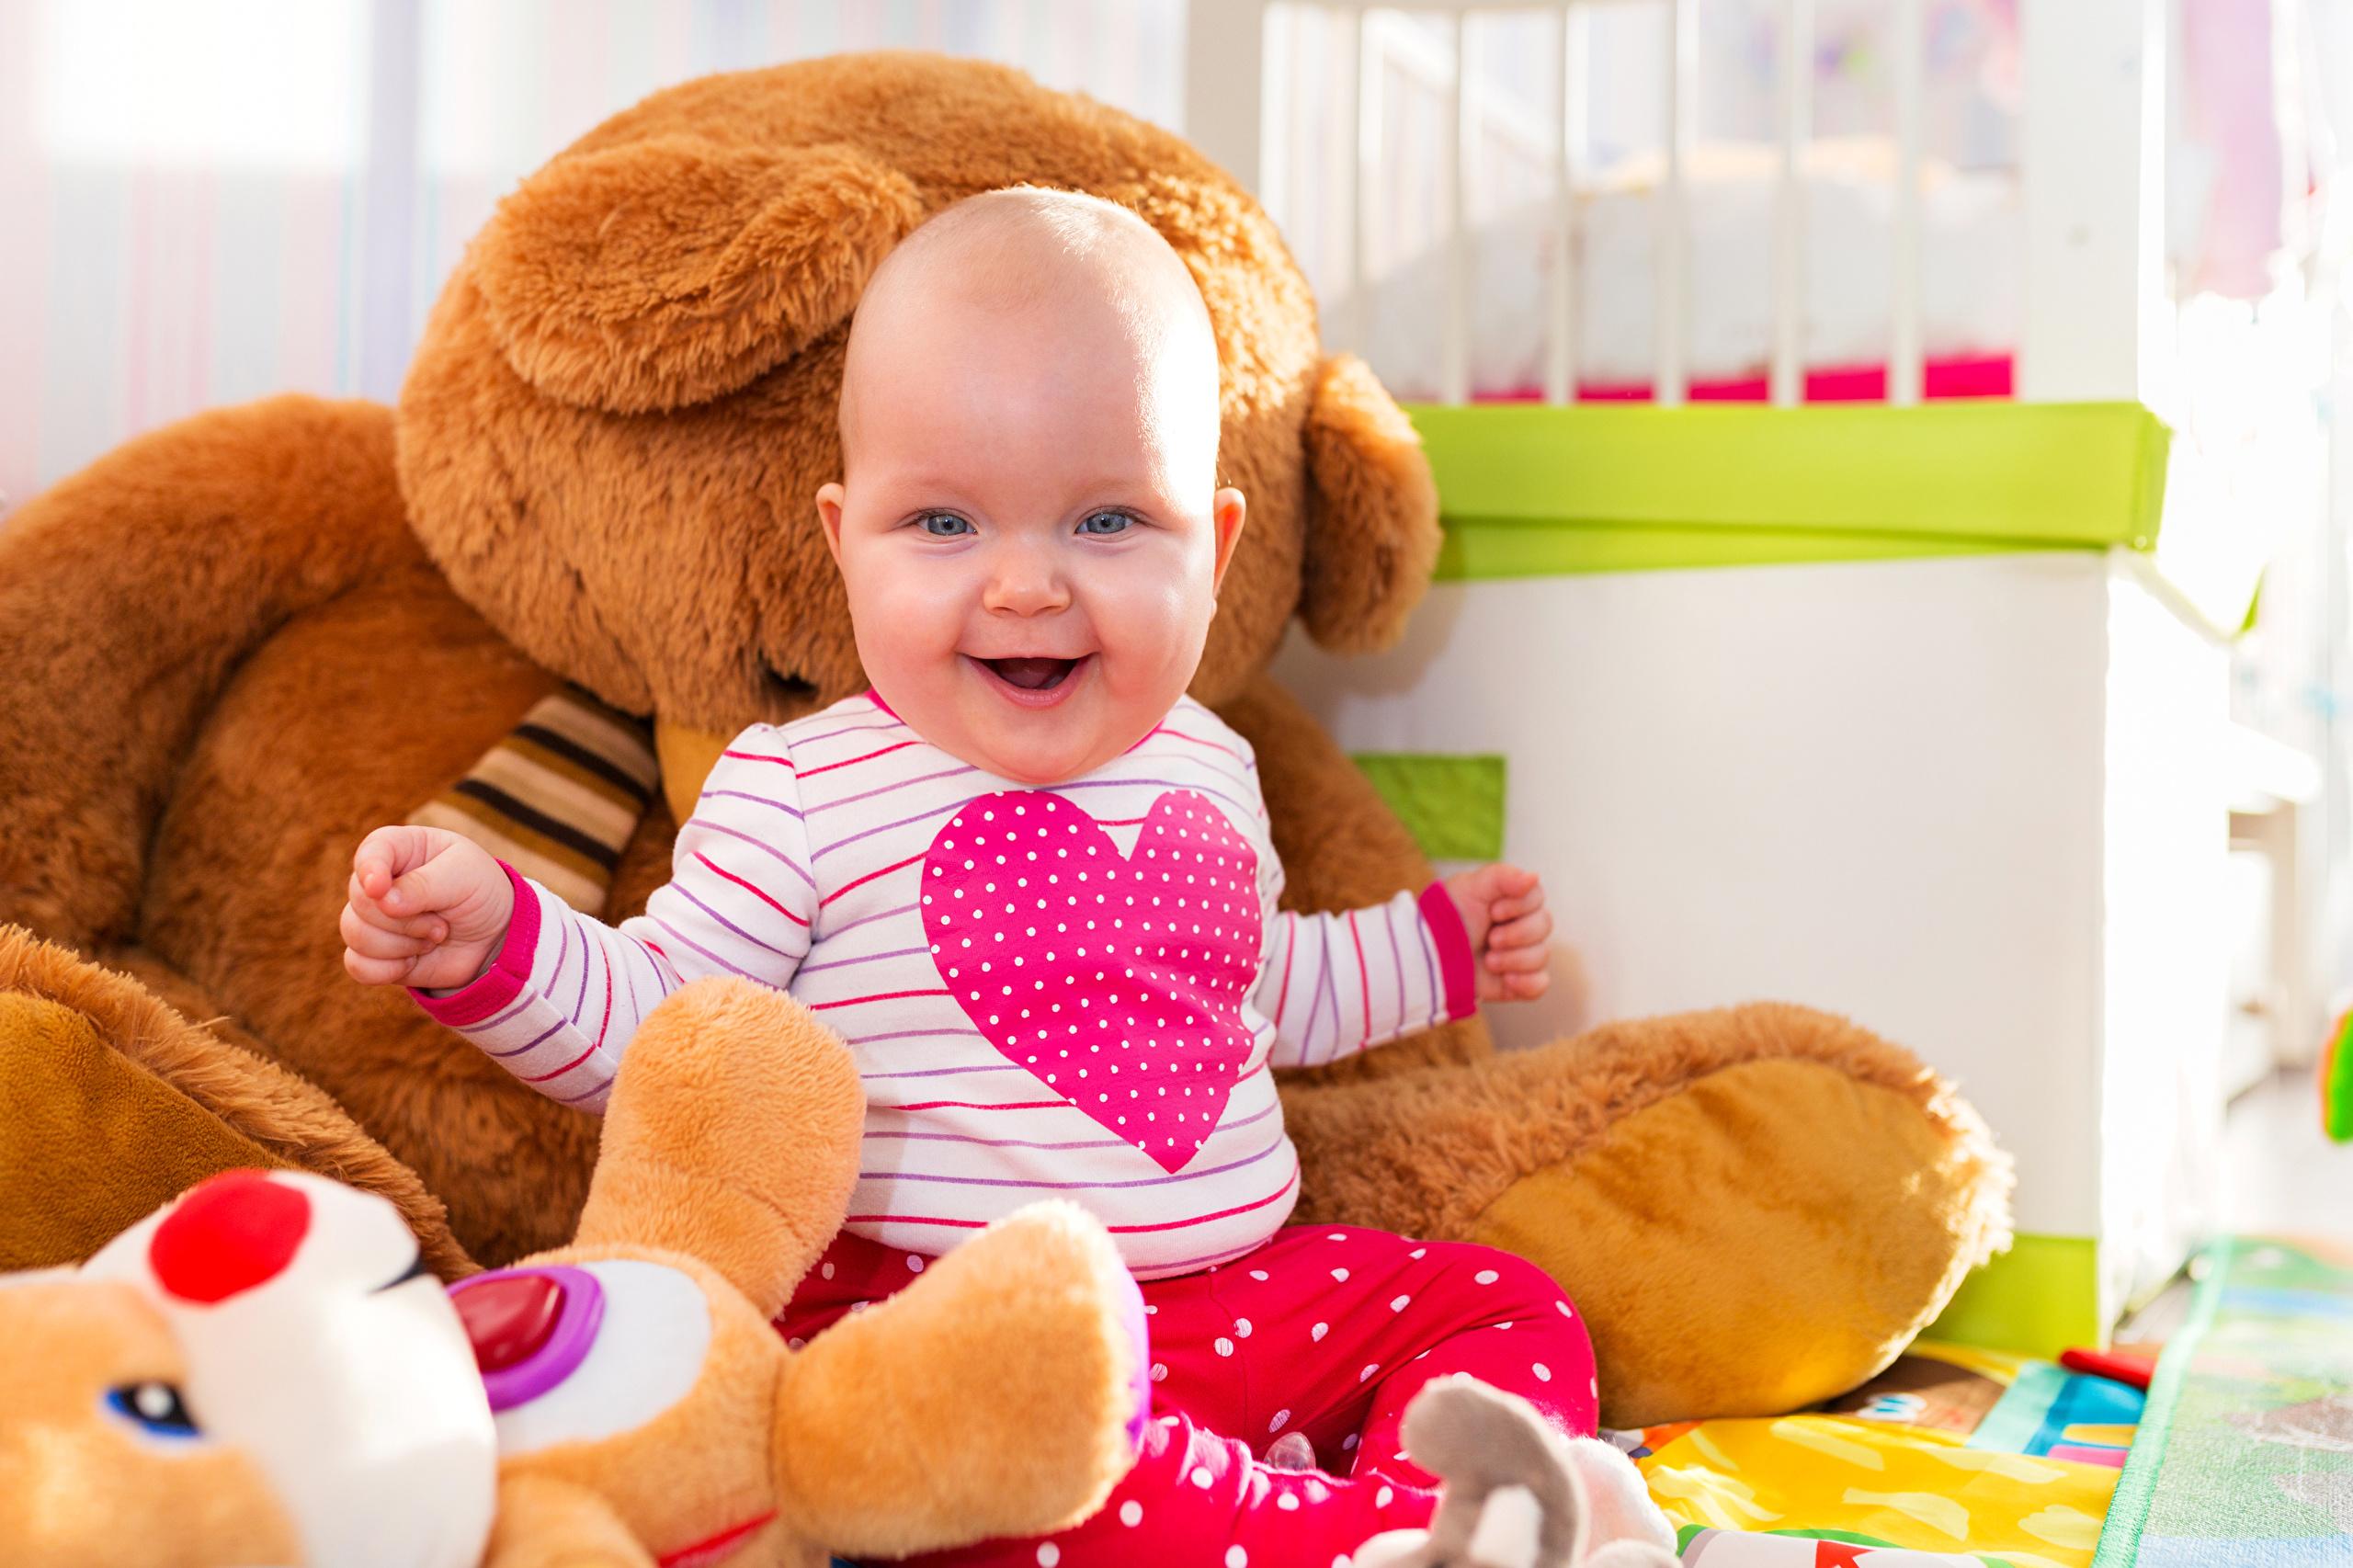 Малыш с мягкими игрушками